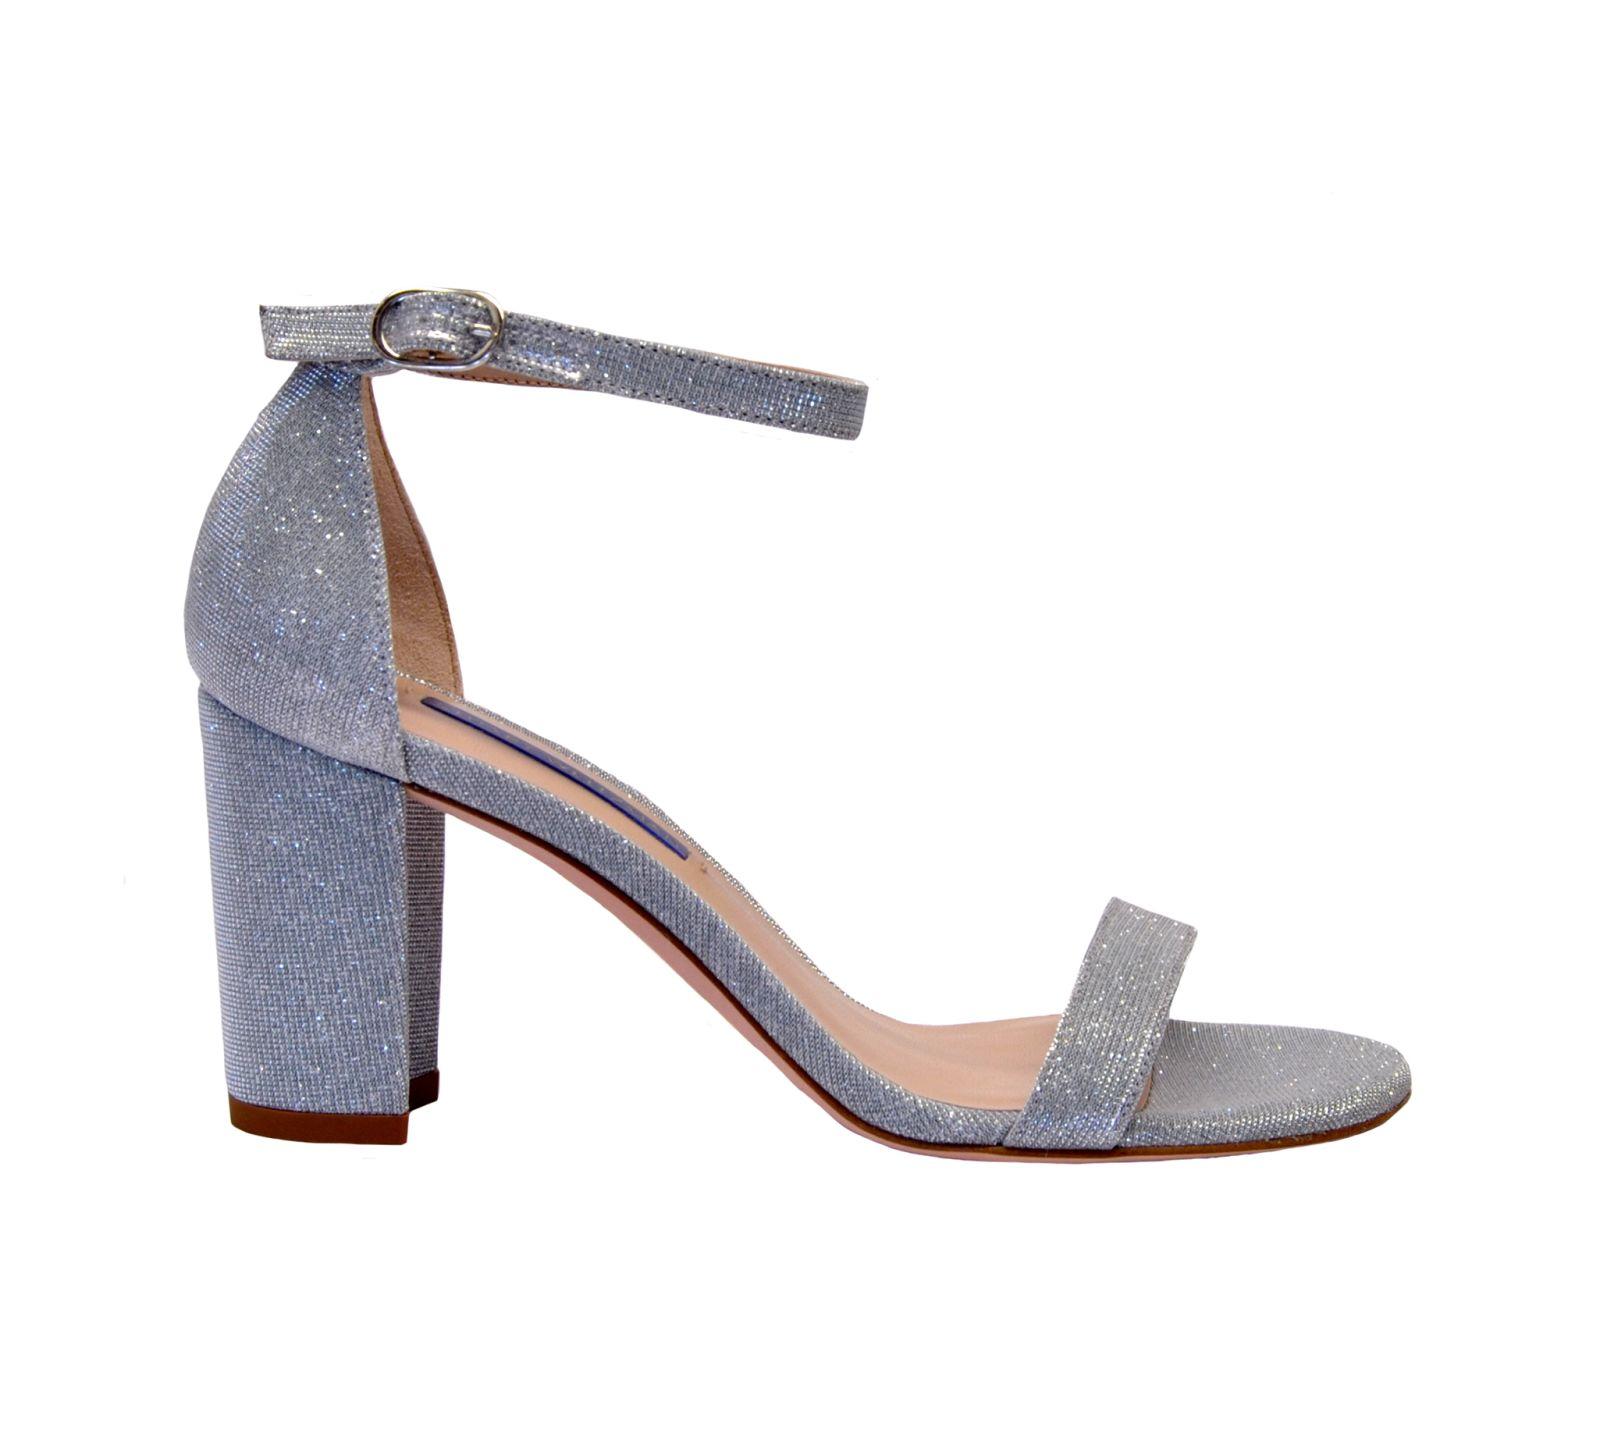 Stuart Weitzman Stuart Weitzman Nearly Nude Sandals - Silver - 10859257  Italist-1752